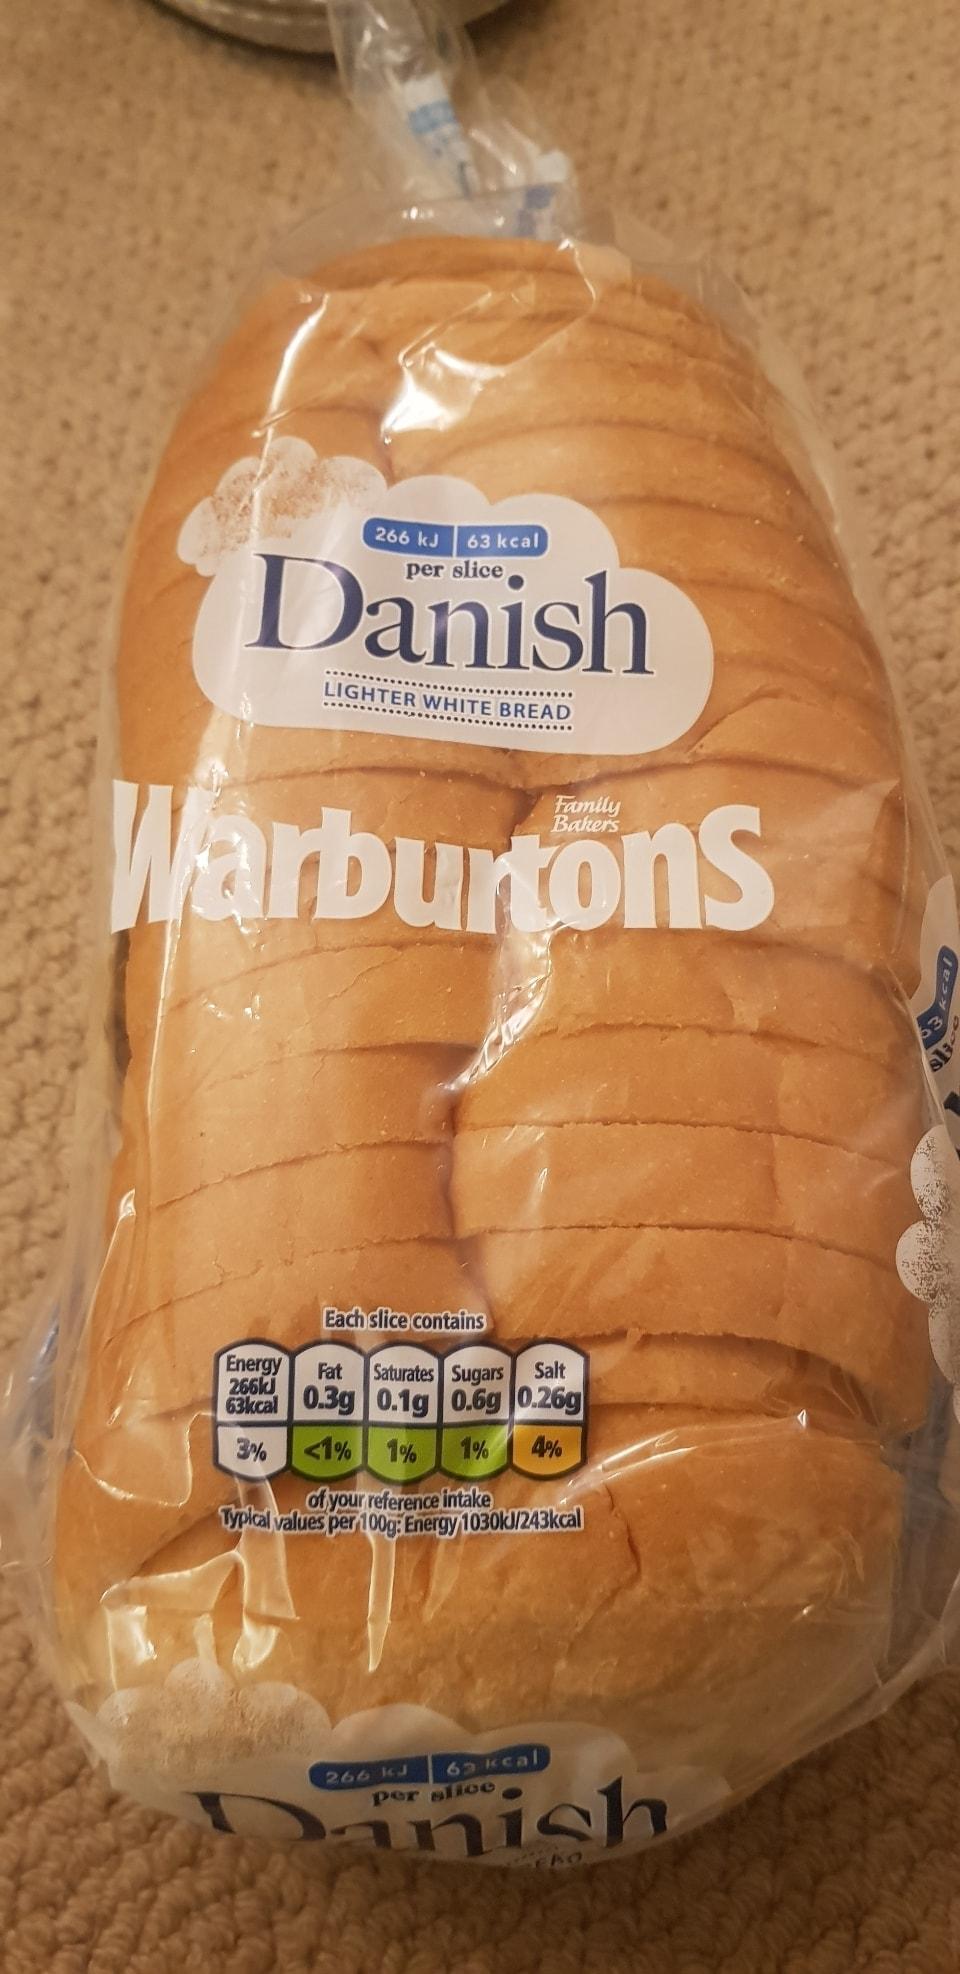 Warburtons Danish Loaf